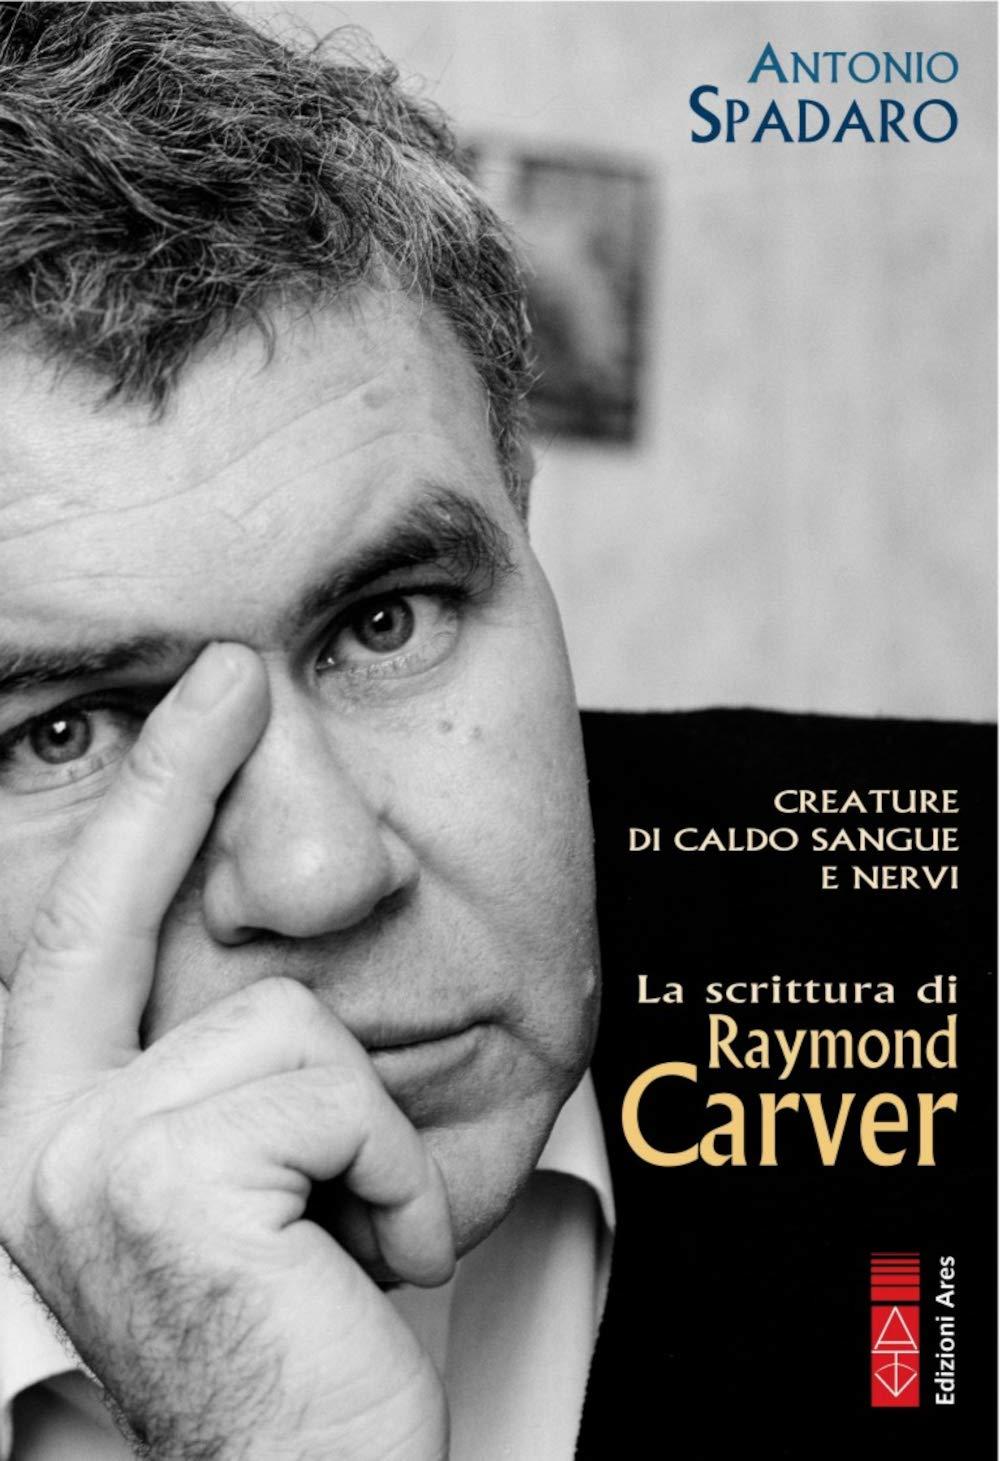 CREATURE DI CALDO SANGUE E NERVI. La scrittura di Raymond Carver